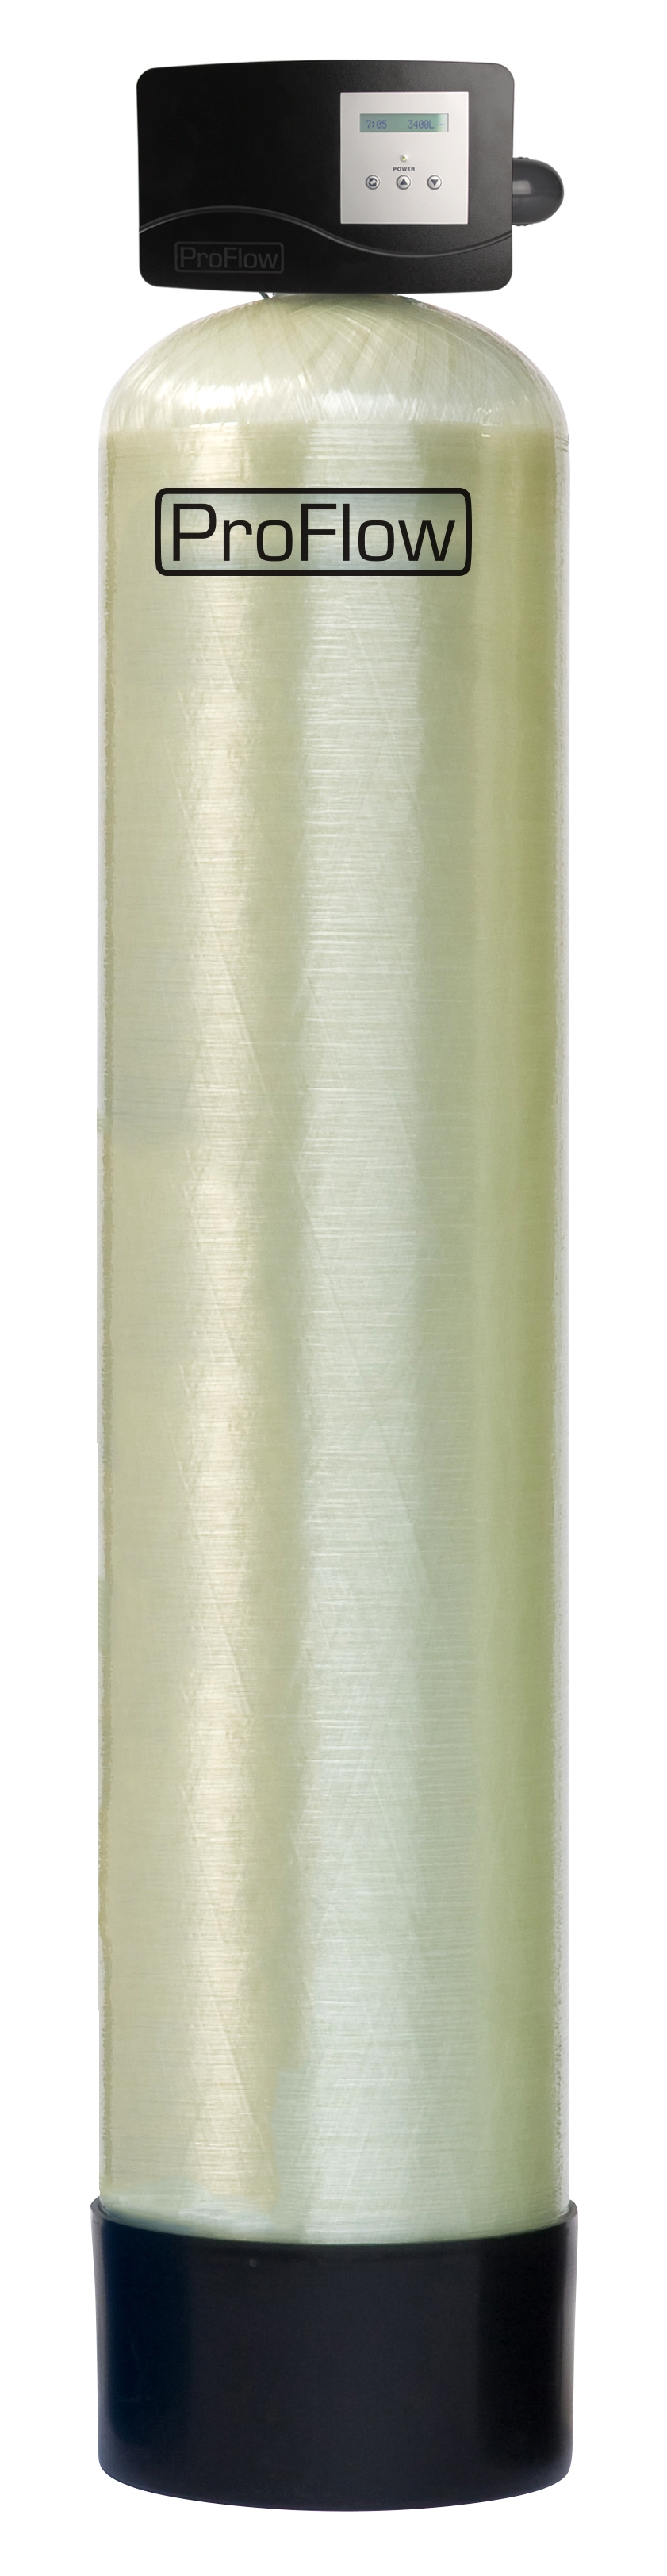 Nugeležinimo filtras PF-OXY1,5 4